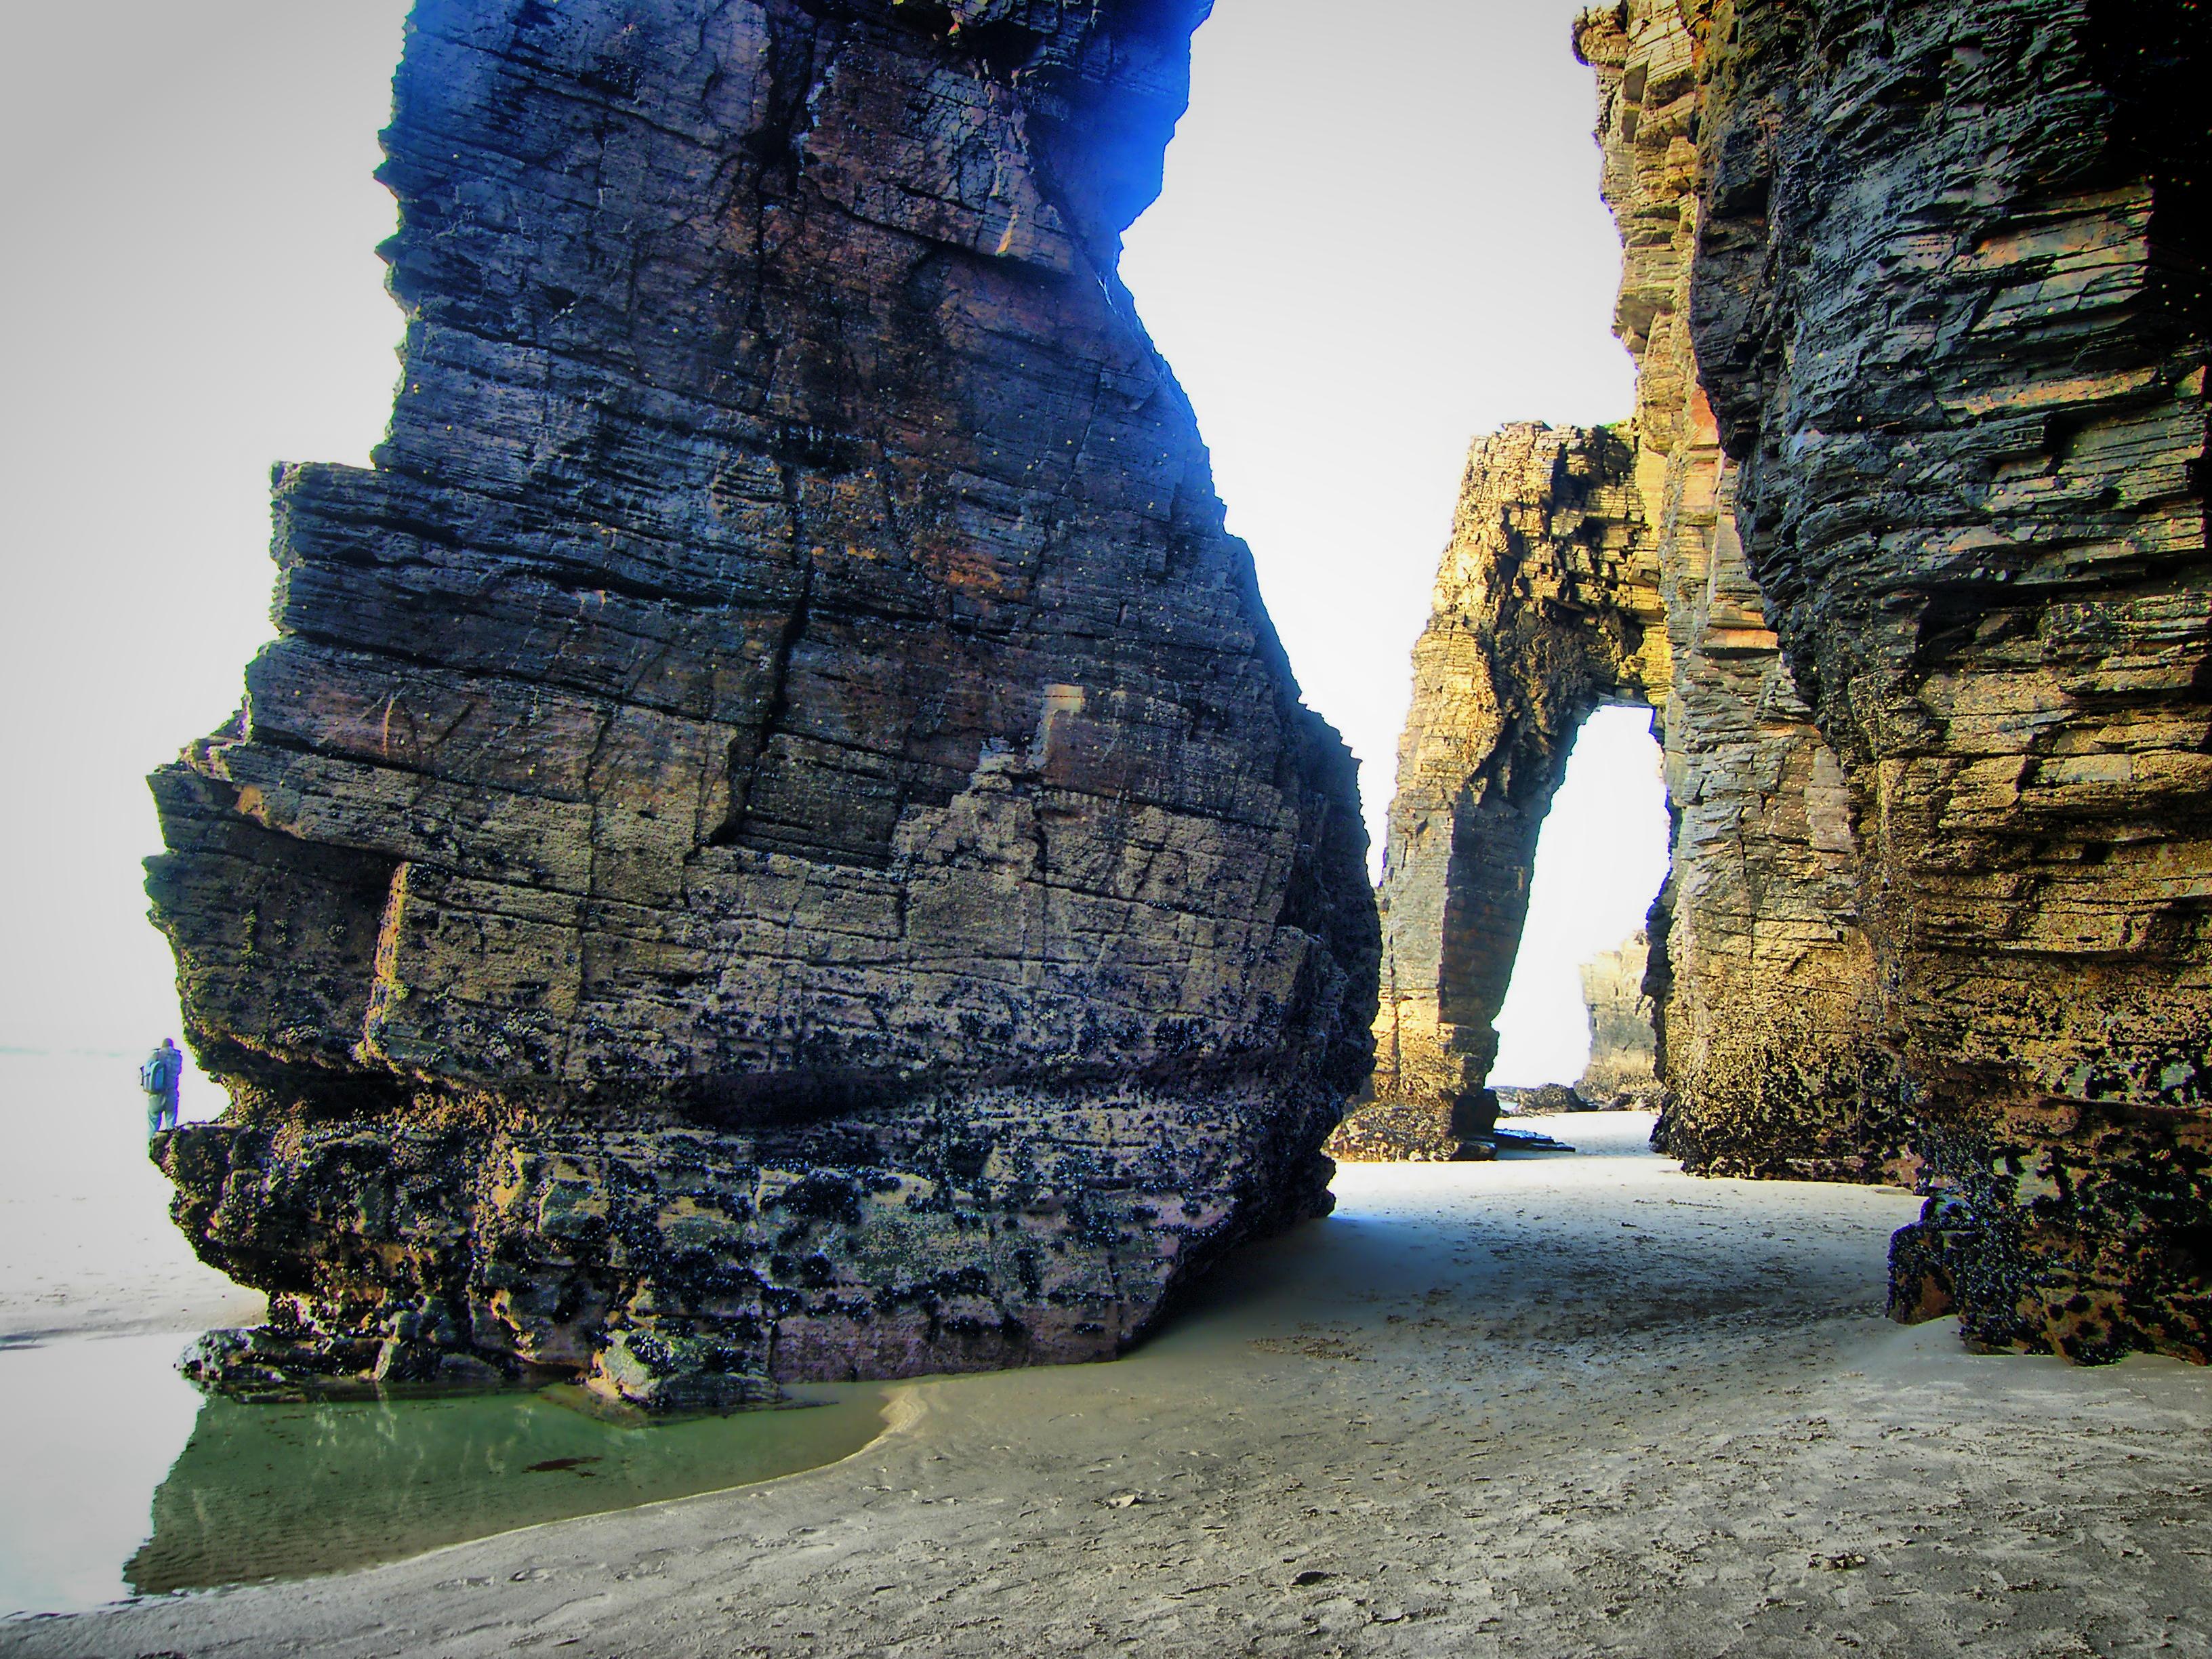 playa de las catedrales geologia